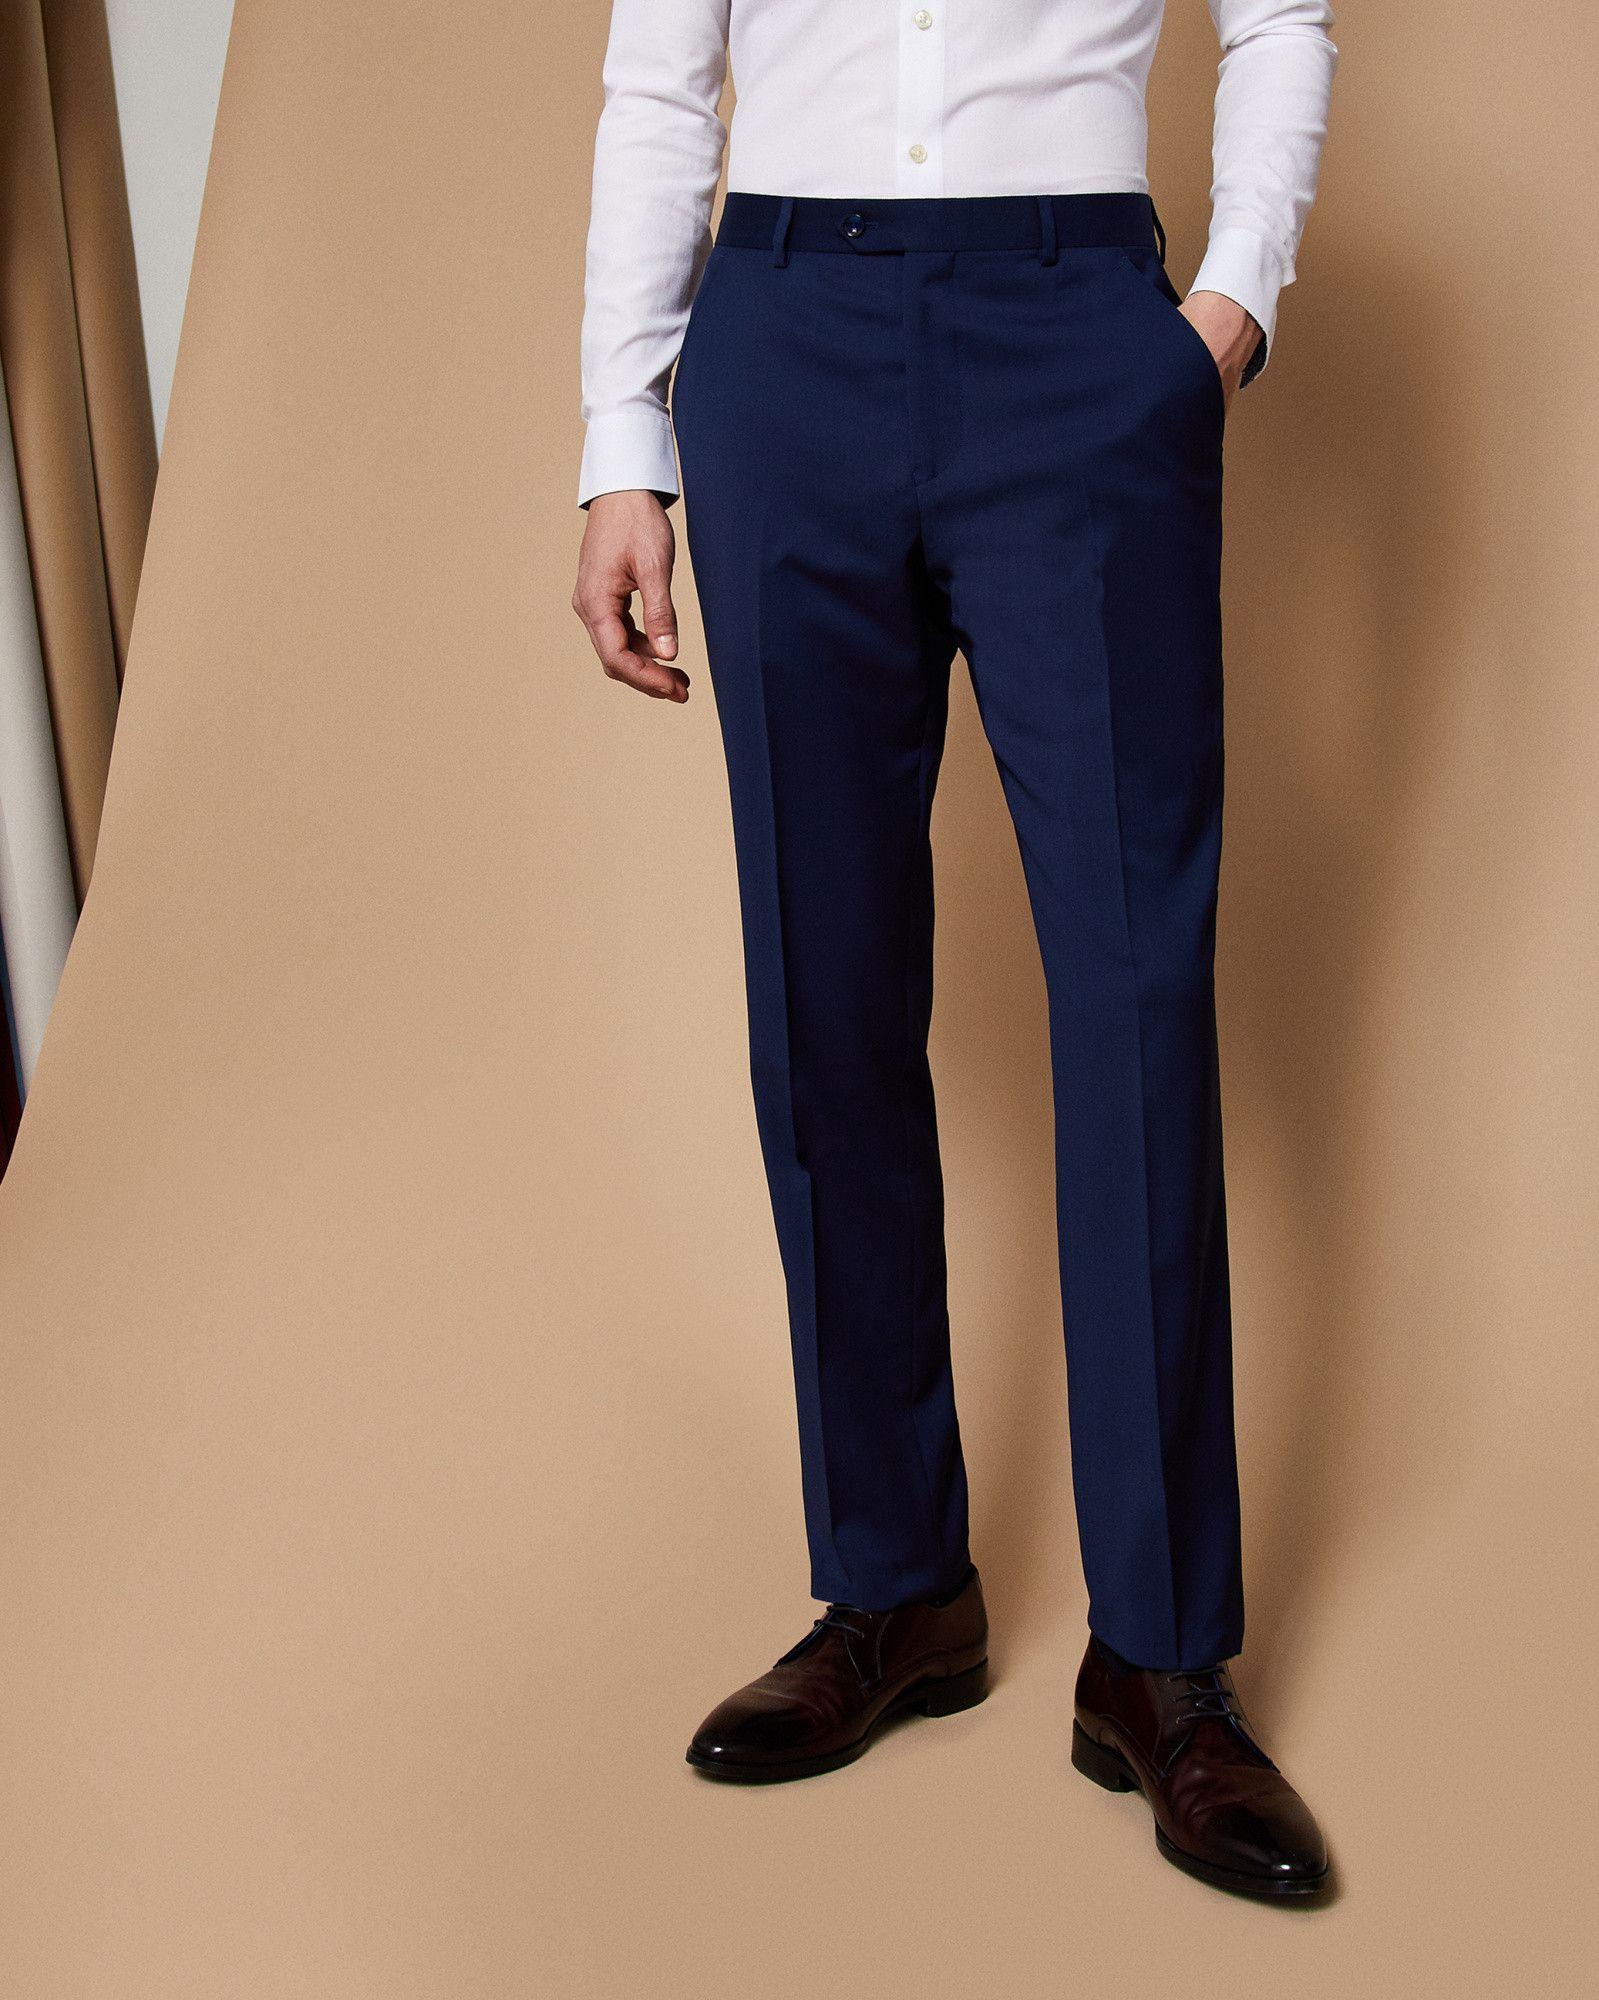 5b0ffc8d Ted Baker Debonair plain wool suit trousers Navy   Products in 2019 ...